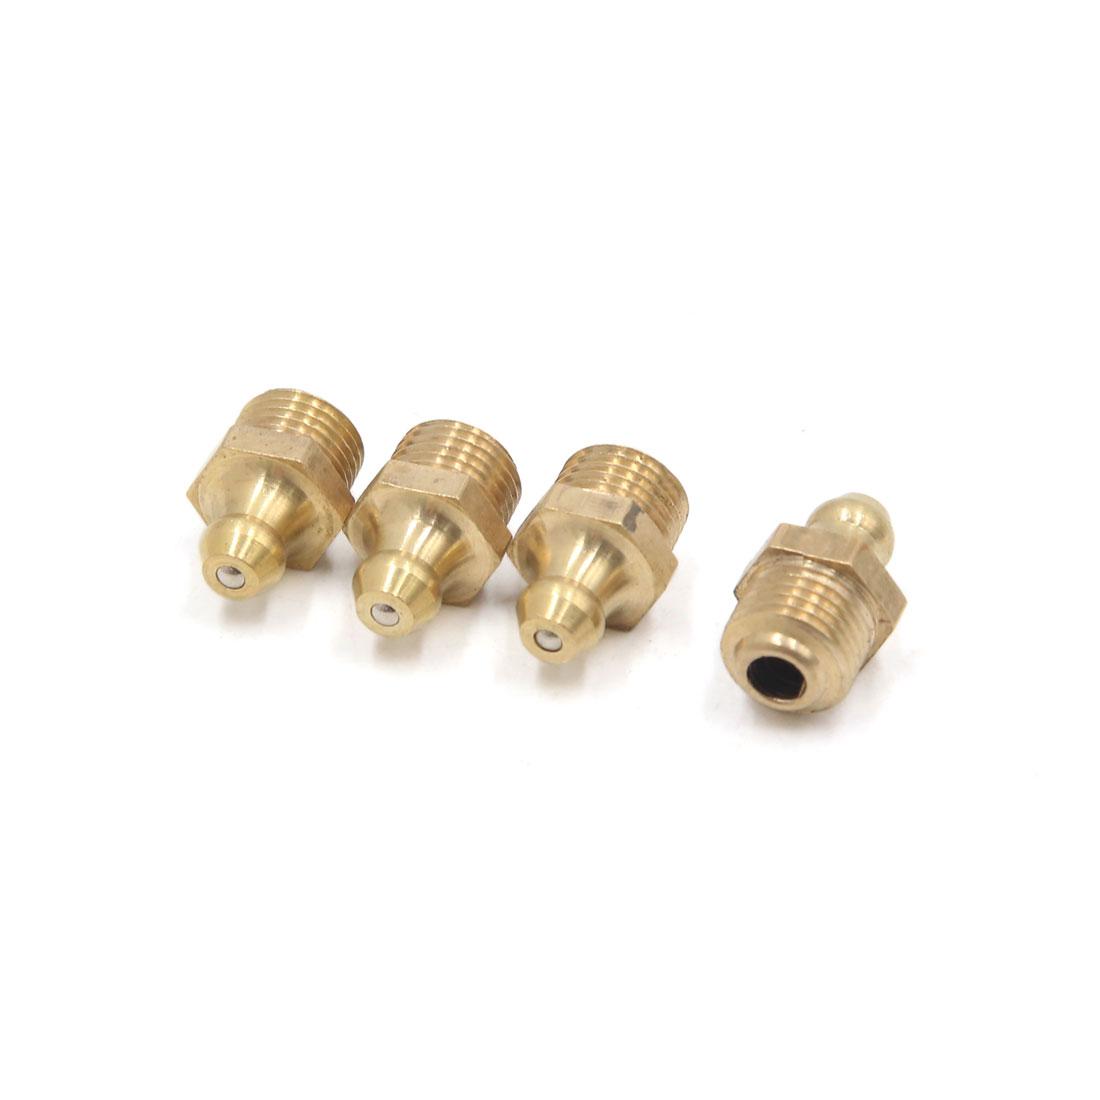 4 Pcs Brass M10 x 1mm Thread Straight Grease Zerk Nipple Fitting for Car